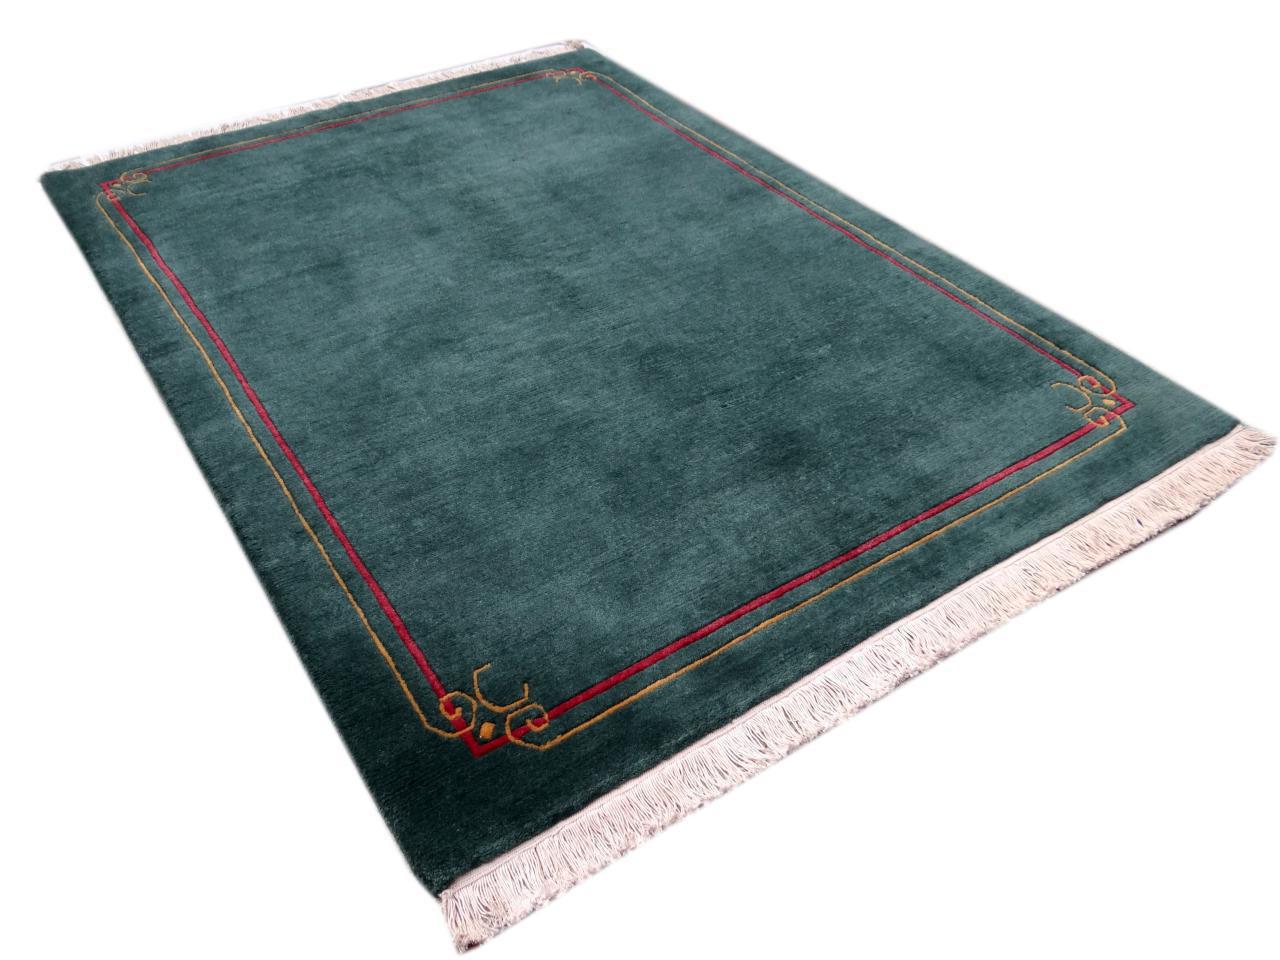 art deco 301 4310 tapis bordures n 34085 200x140cm. Black Bedroom Furniture Sets. Home Design Ideas